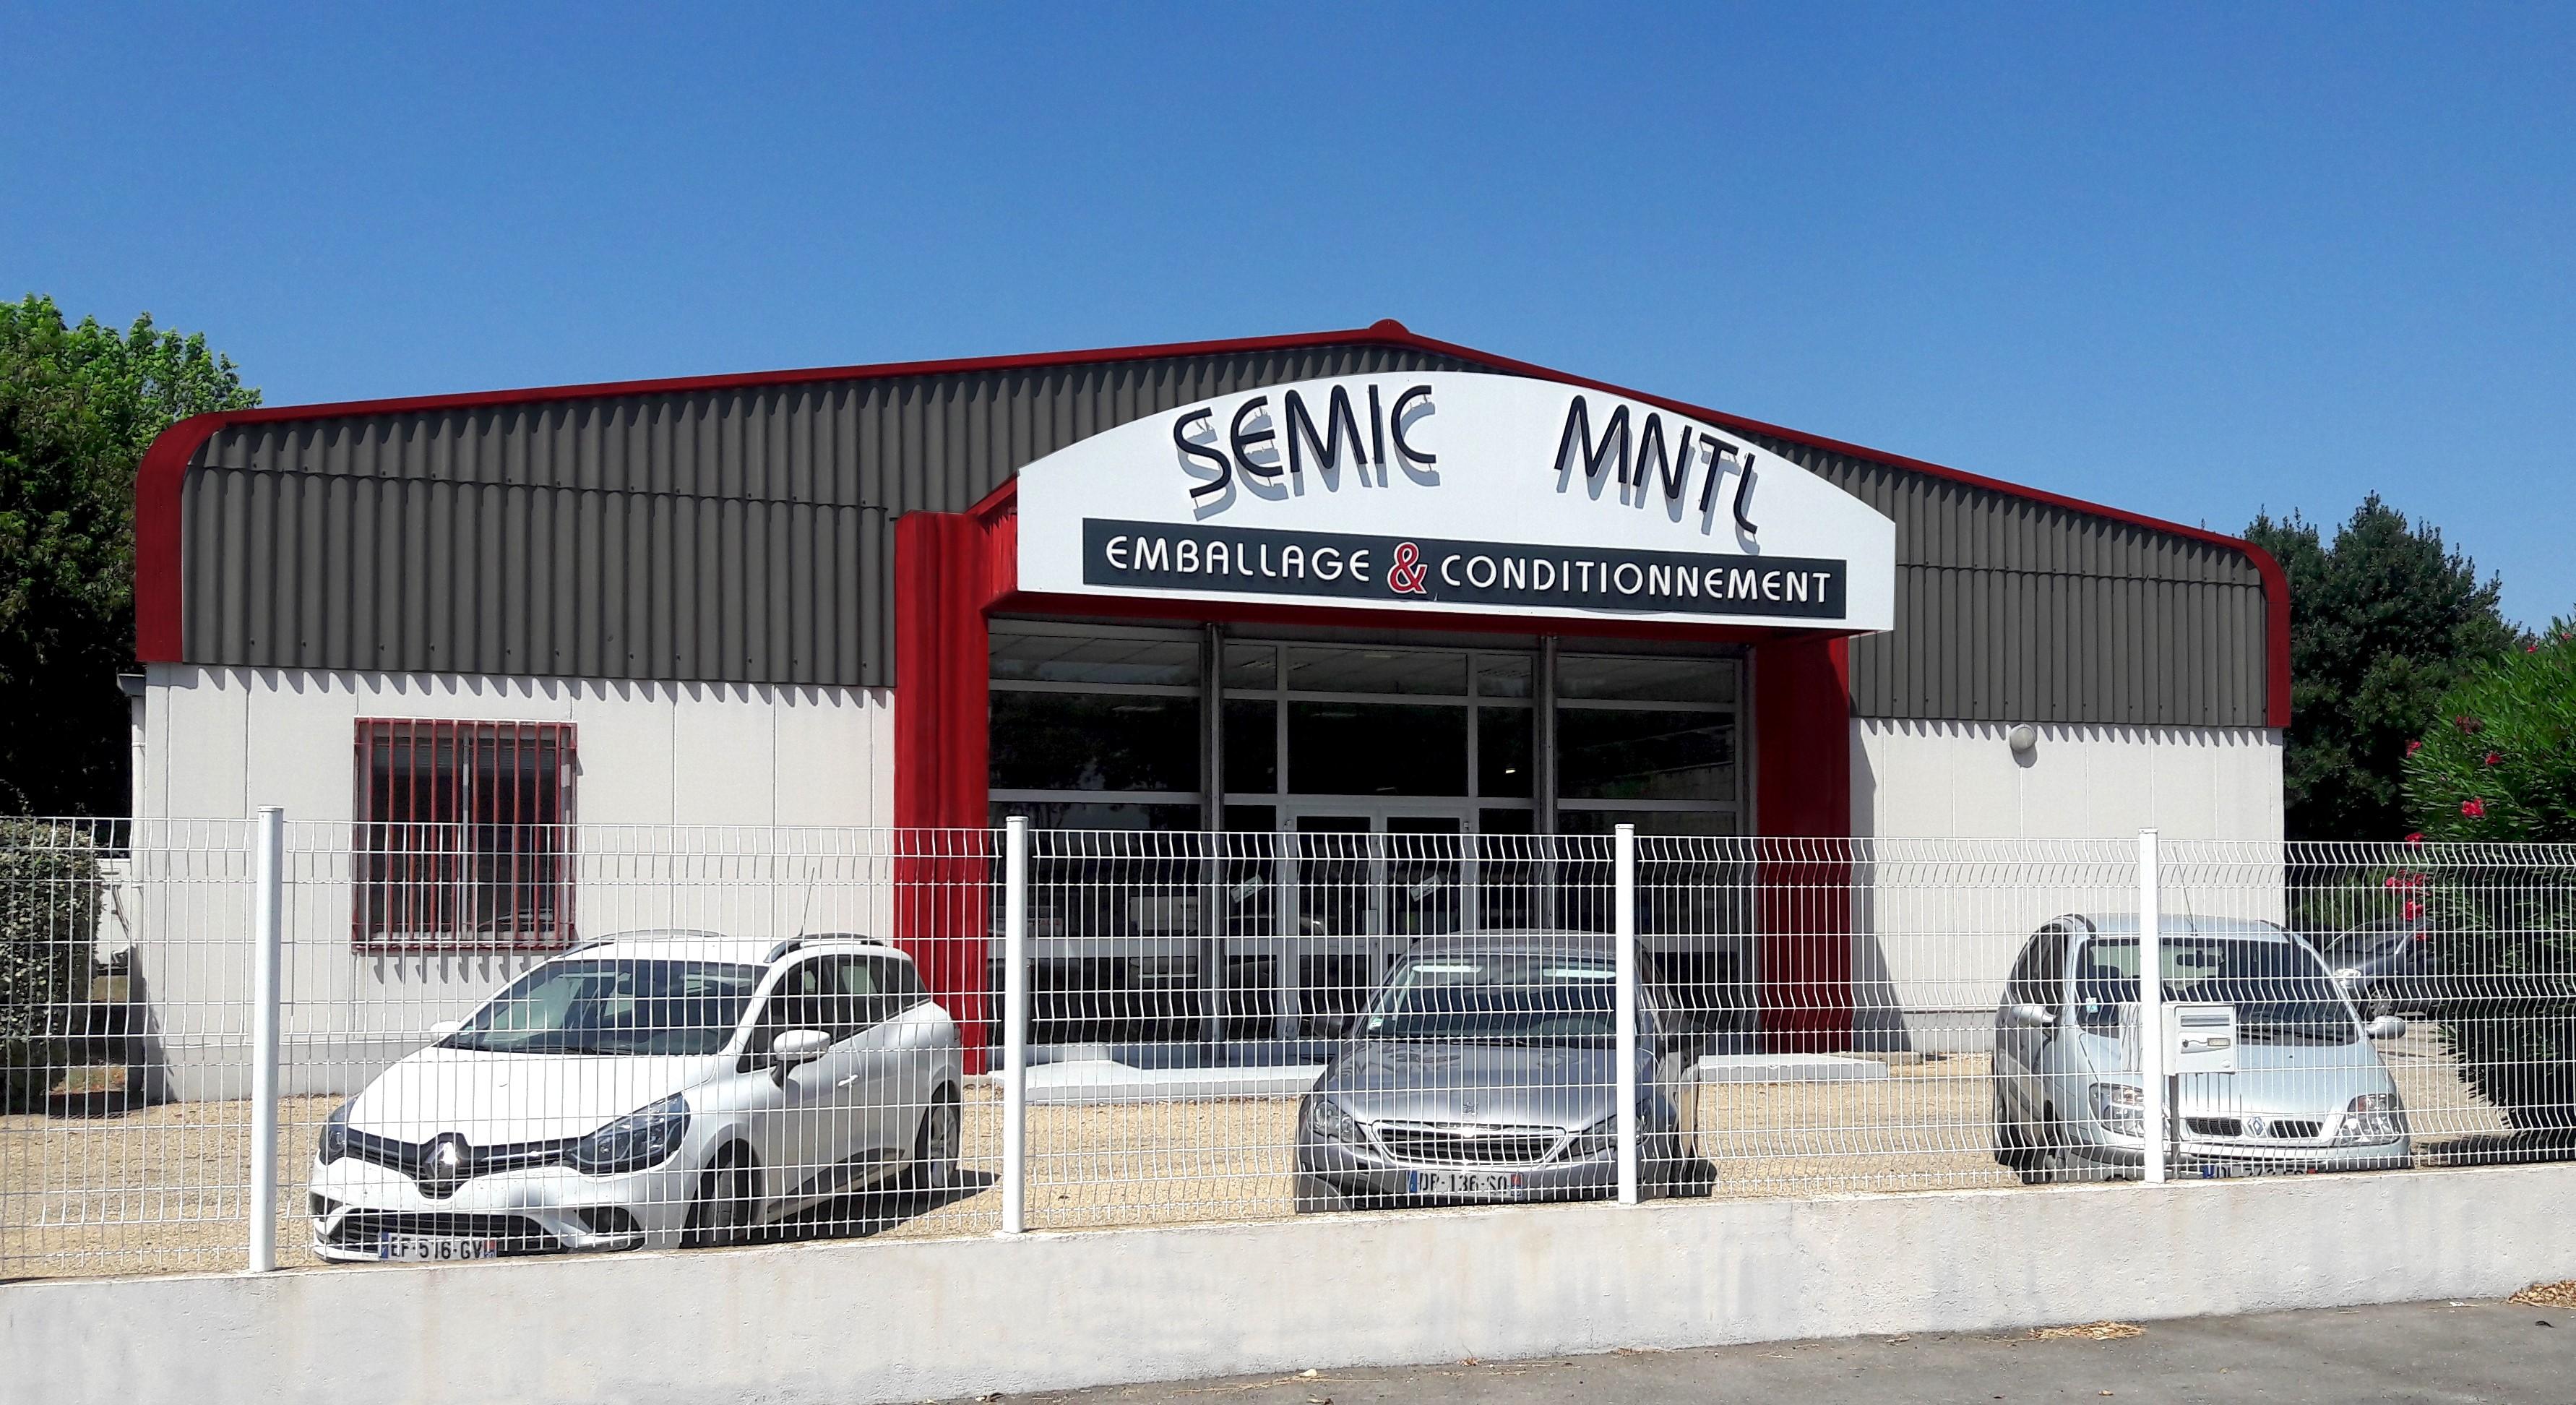 SEMIC-MNTL